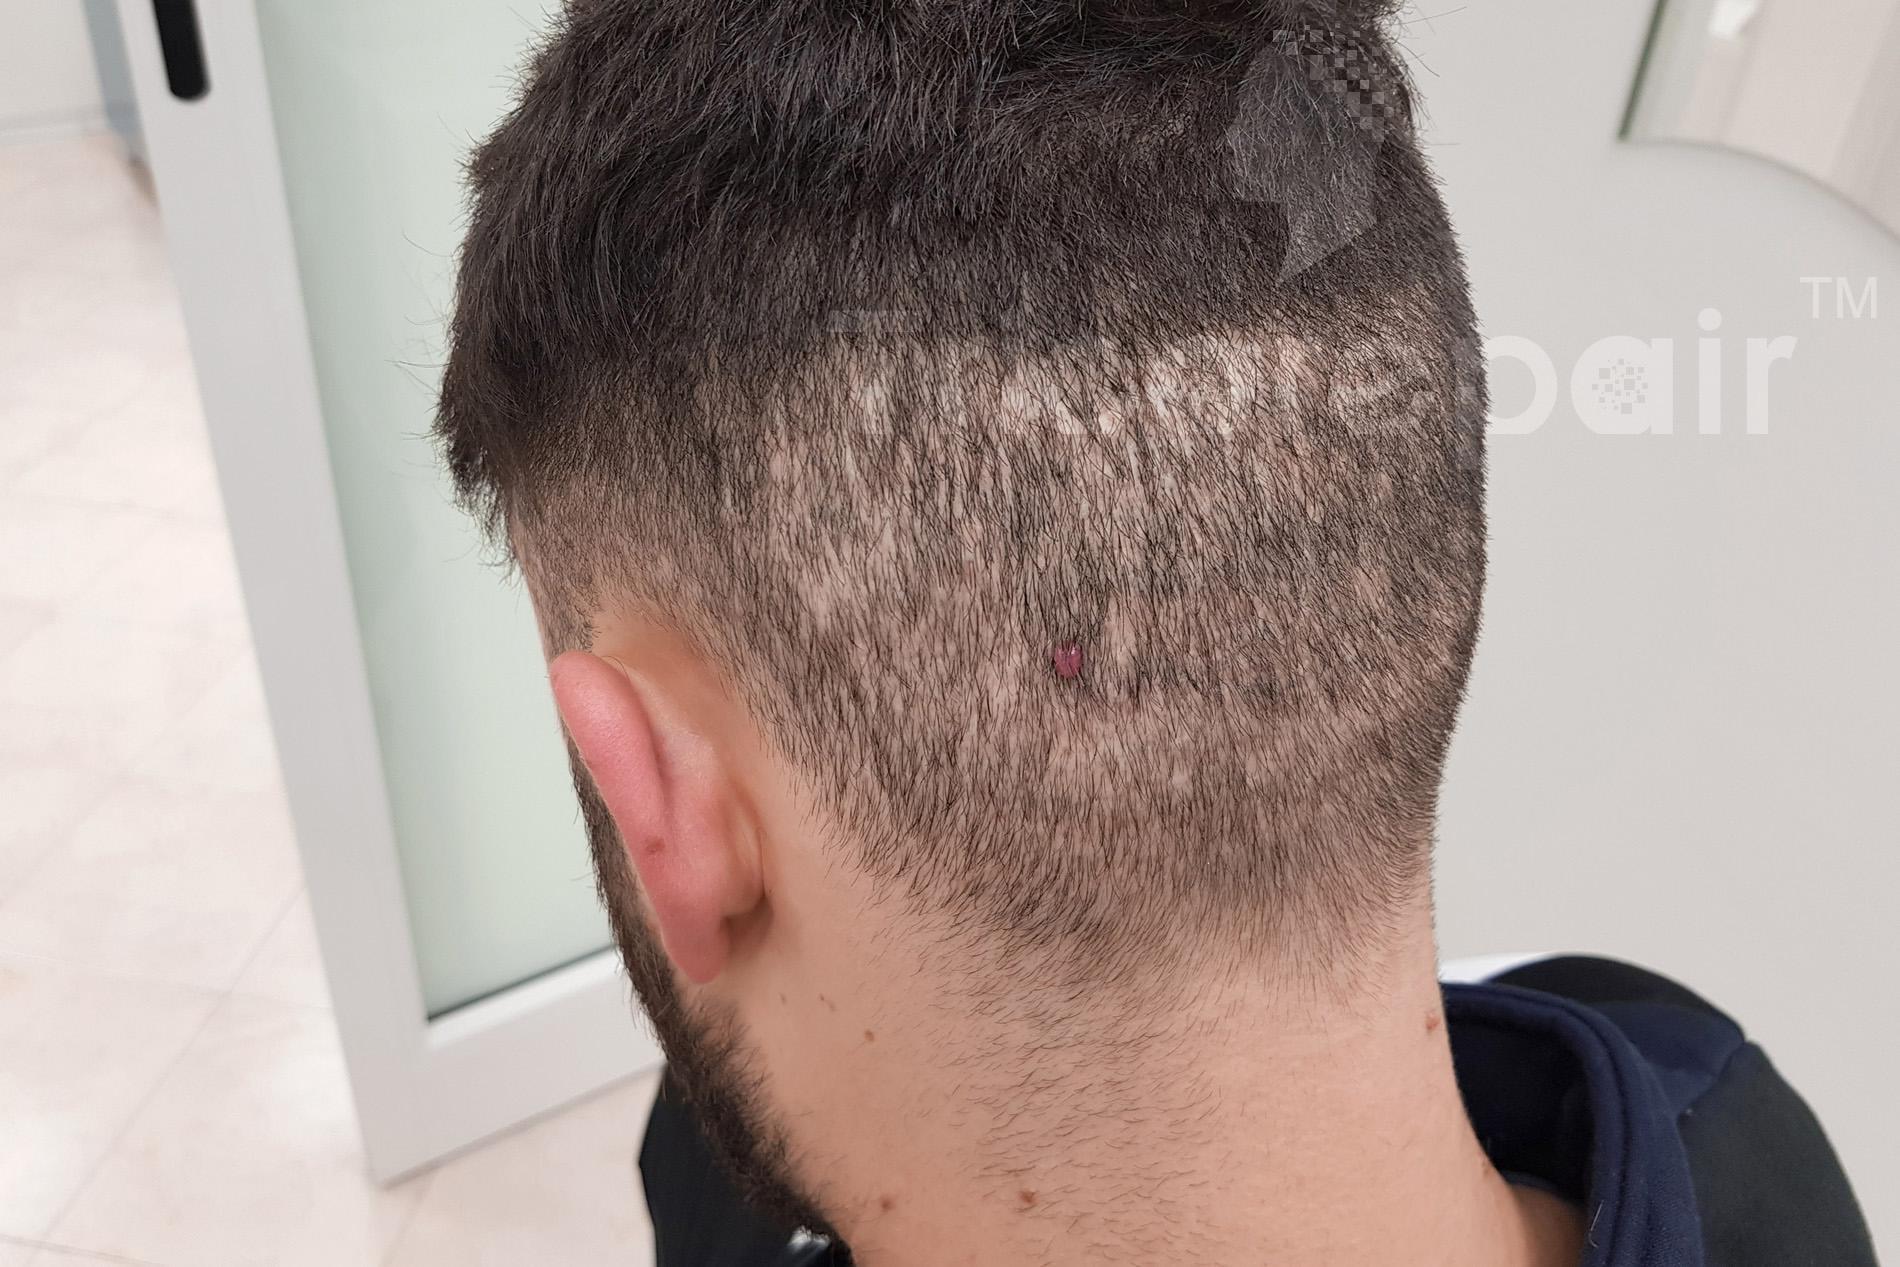 Camouflage cicatrice autotrapianto FUE - Prima del trattamento